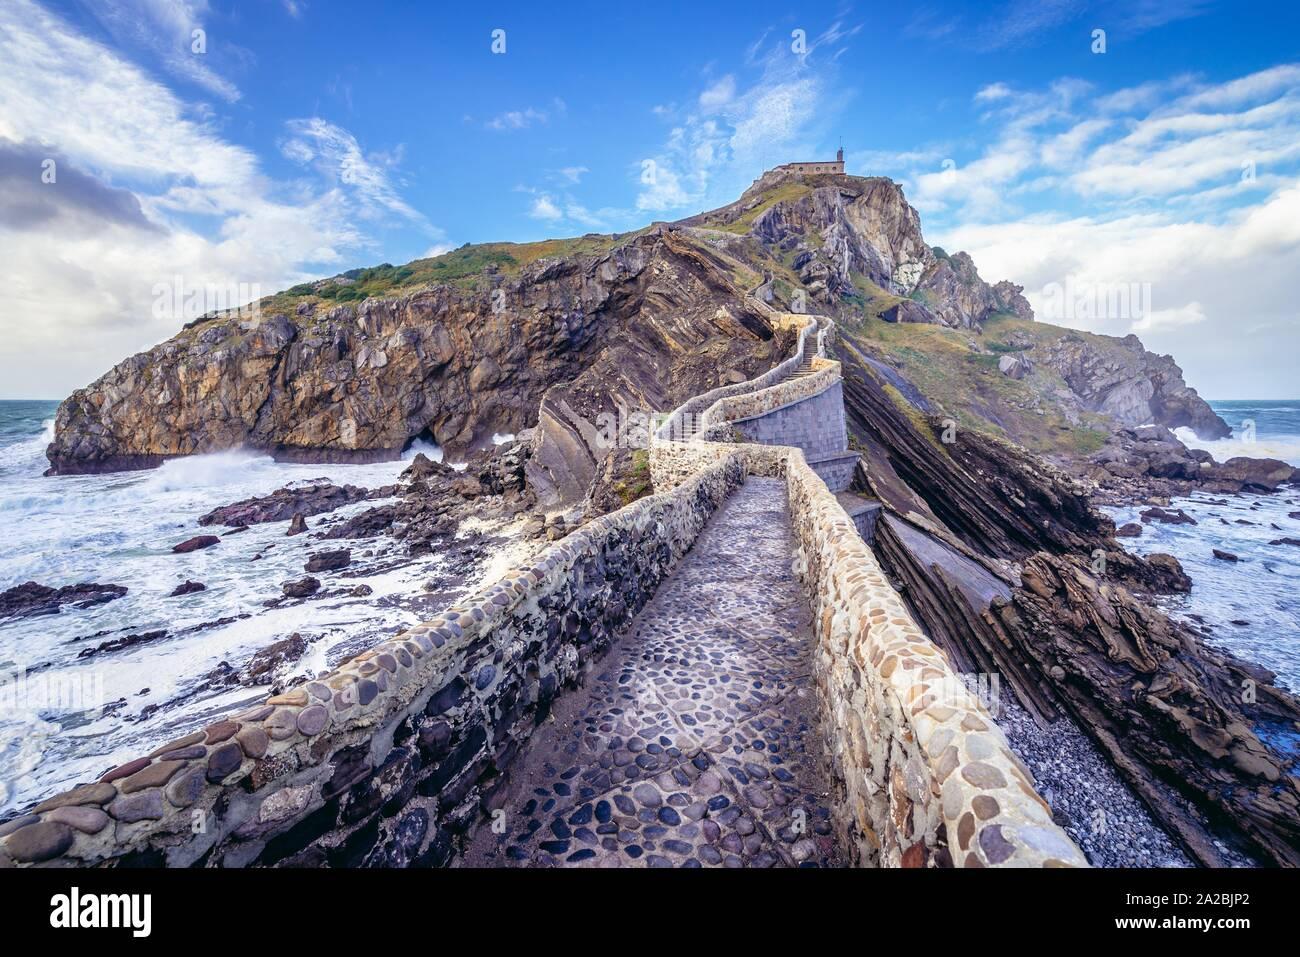 Bridge to hermitage on Gaztelugatxe islet in on the coast of Biscay province of Spain. Stock Photo